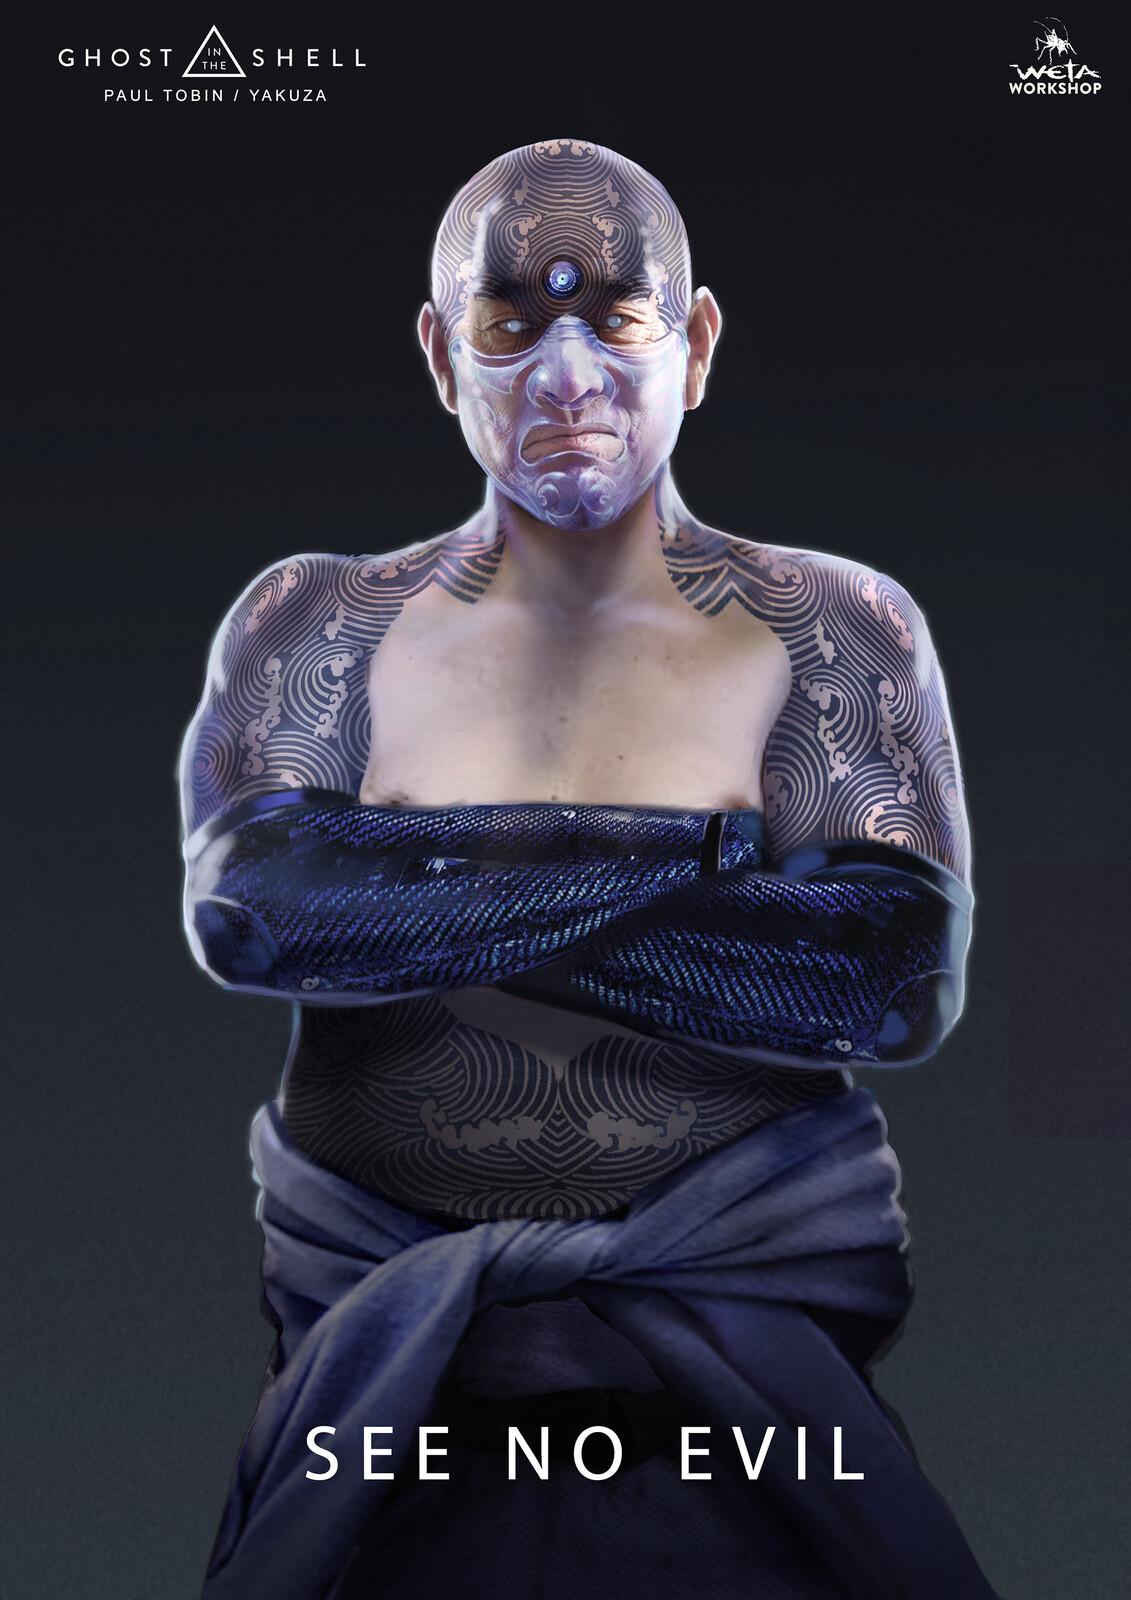 Ghost in the Shell : Yakuza